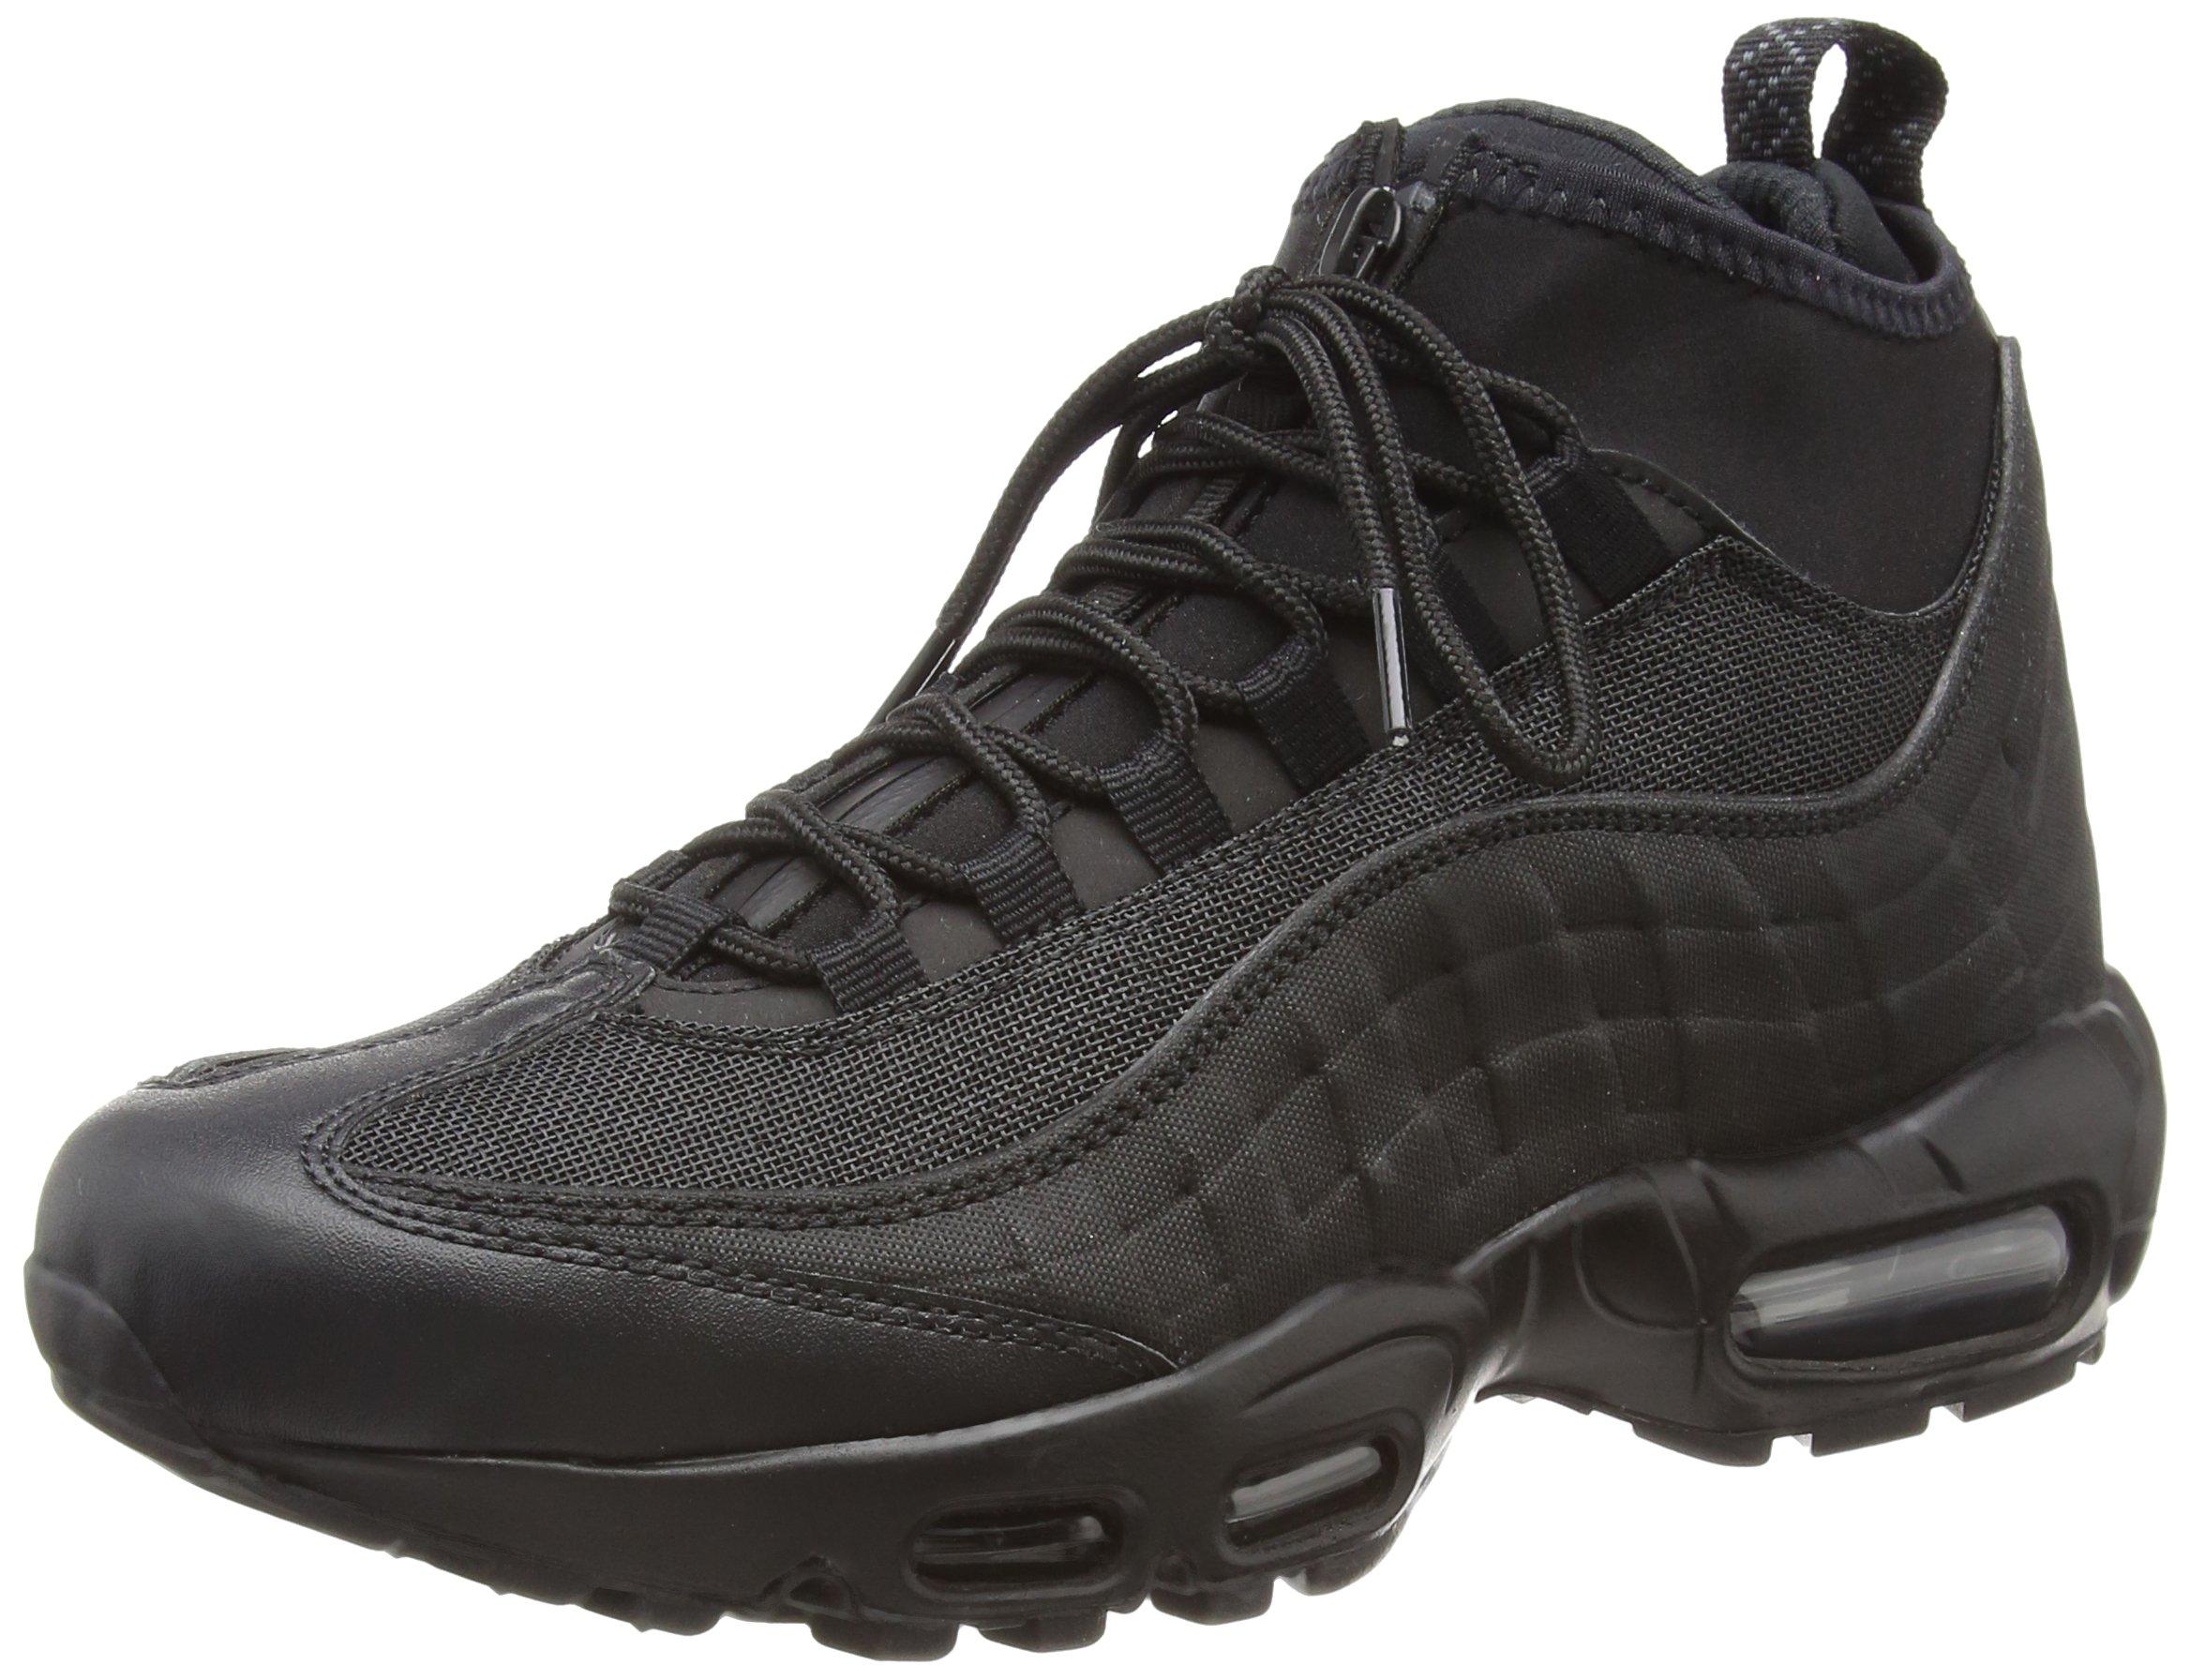 innovative design c9409 5acf0 Galleon - NIKE Men s Air Max 95 Sneakerboot (6 D(M) US, Black Black)